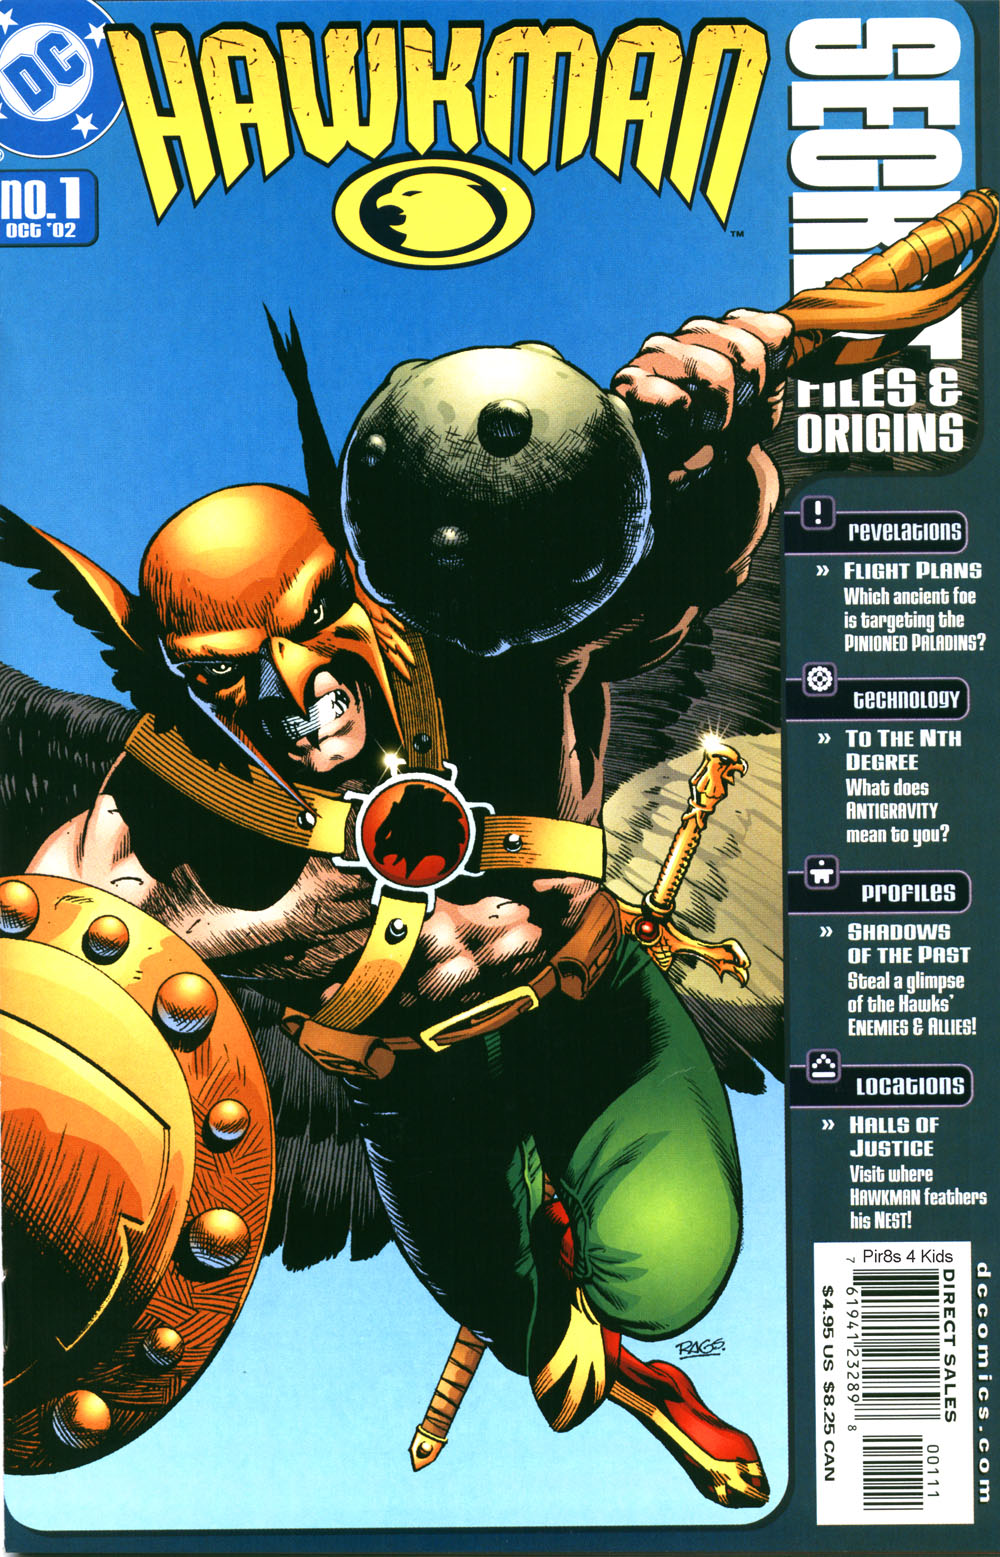 Hawkman Secret Files and Origins 1 Page 1